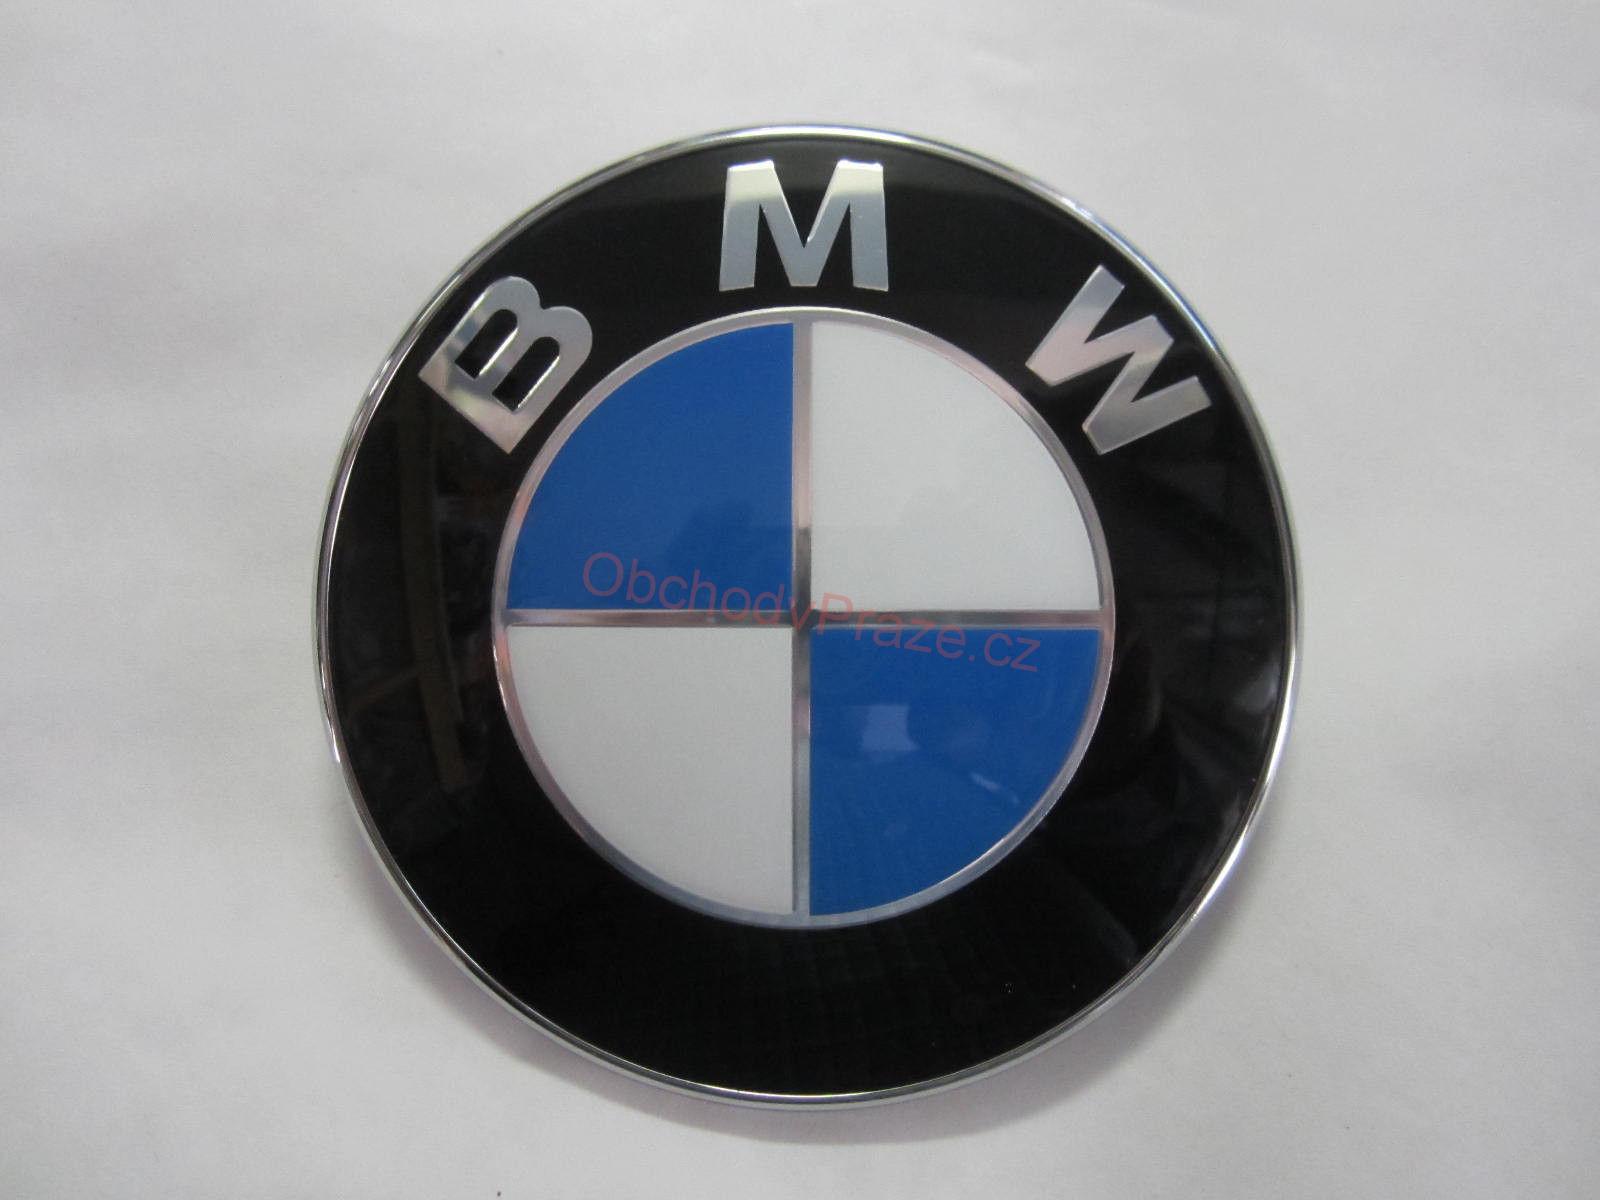 BMW emblem logo znak na kapotu 1 2 3 4 5 6 7 E30 E34 E36 E38 E39 E63 E65 E53 E70